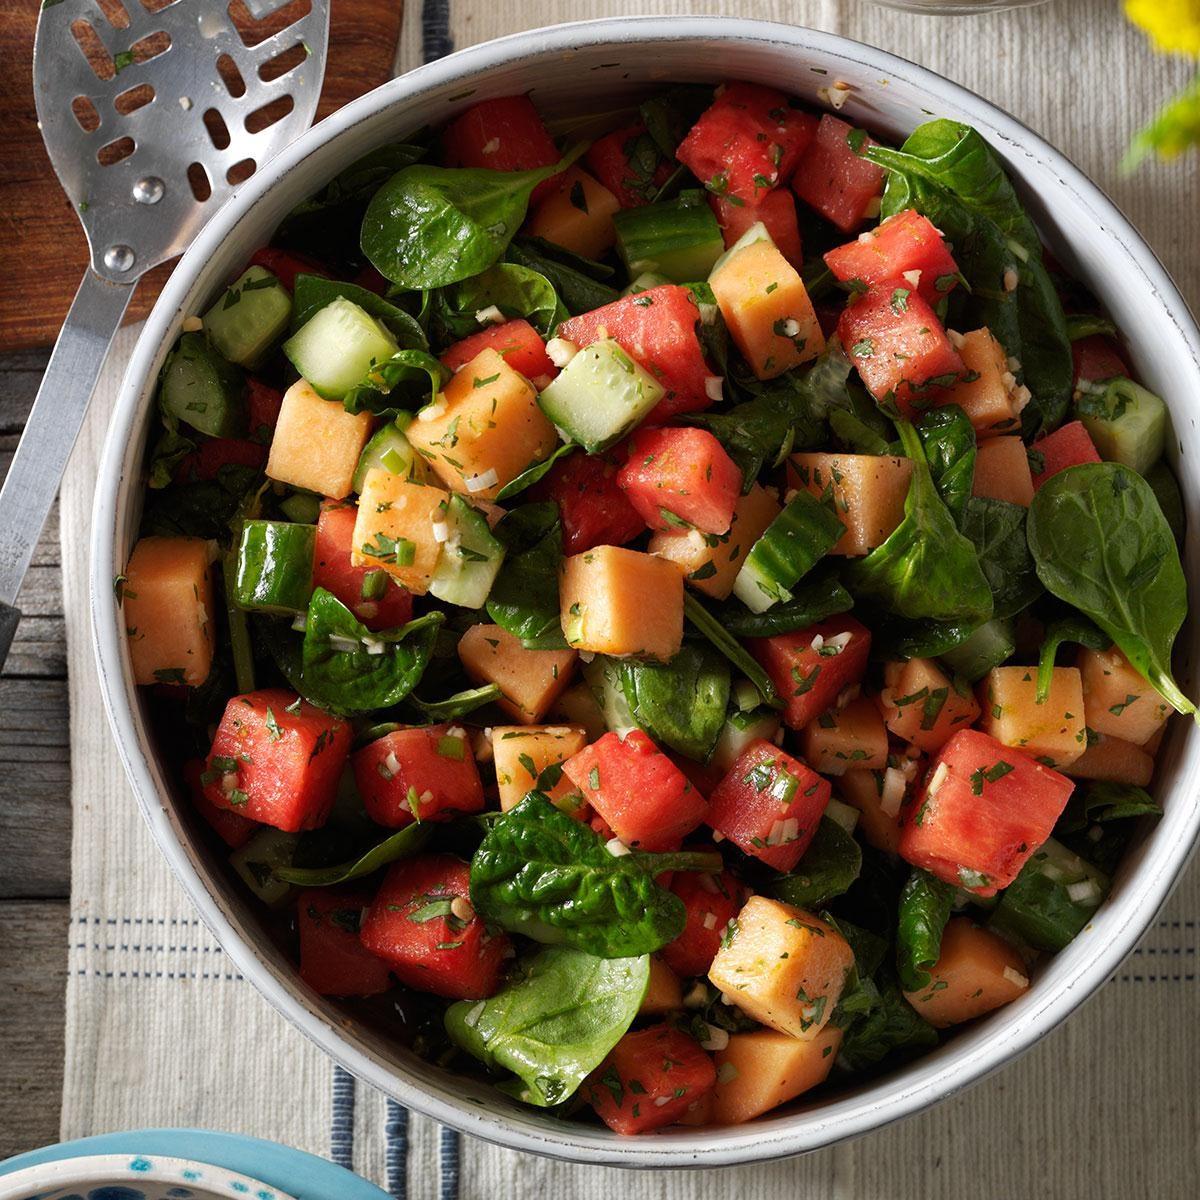 Hawaii: Watermelon and Spinach Salad